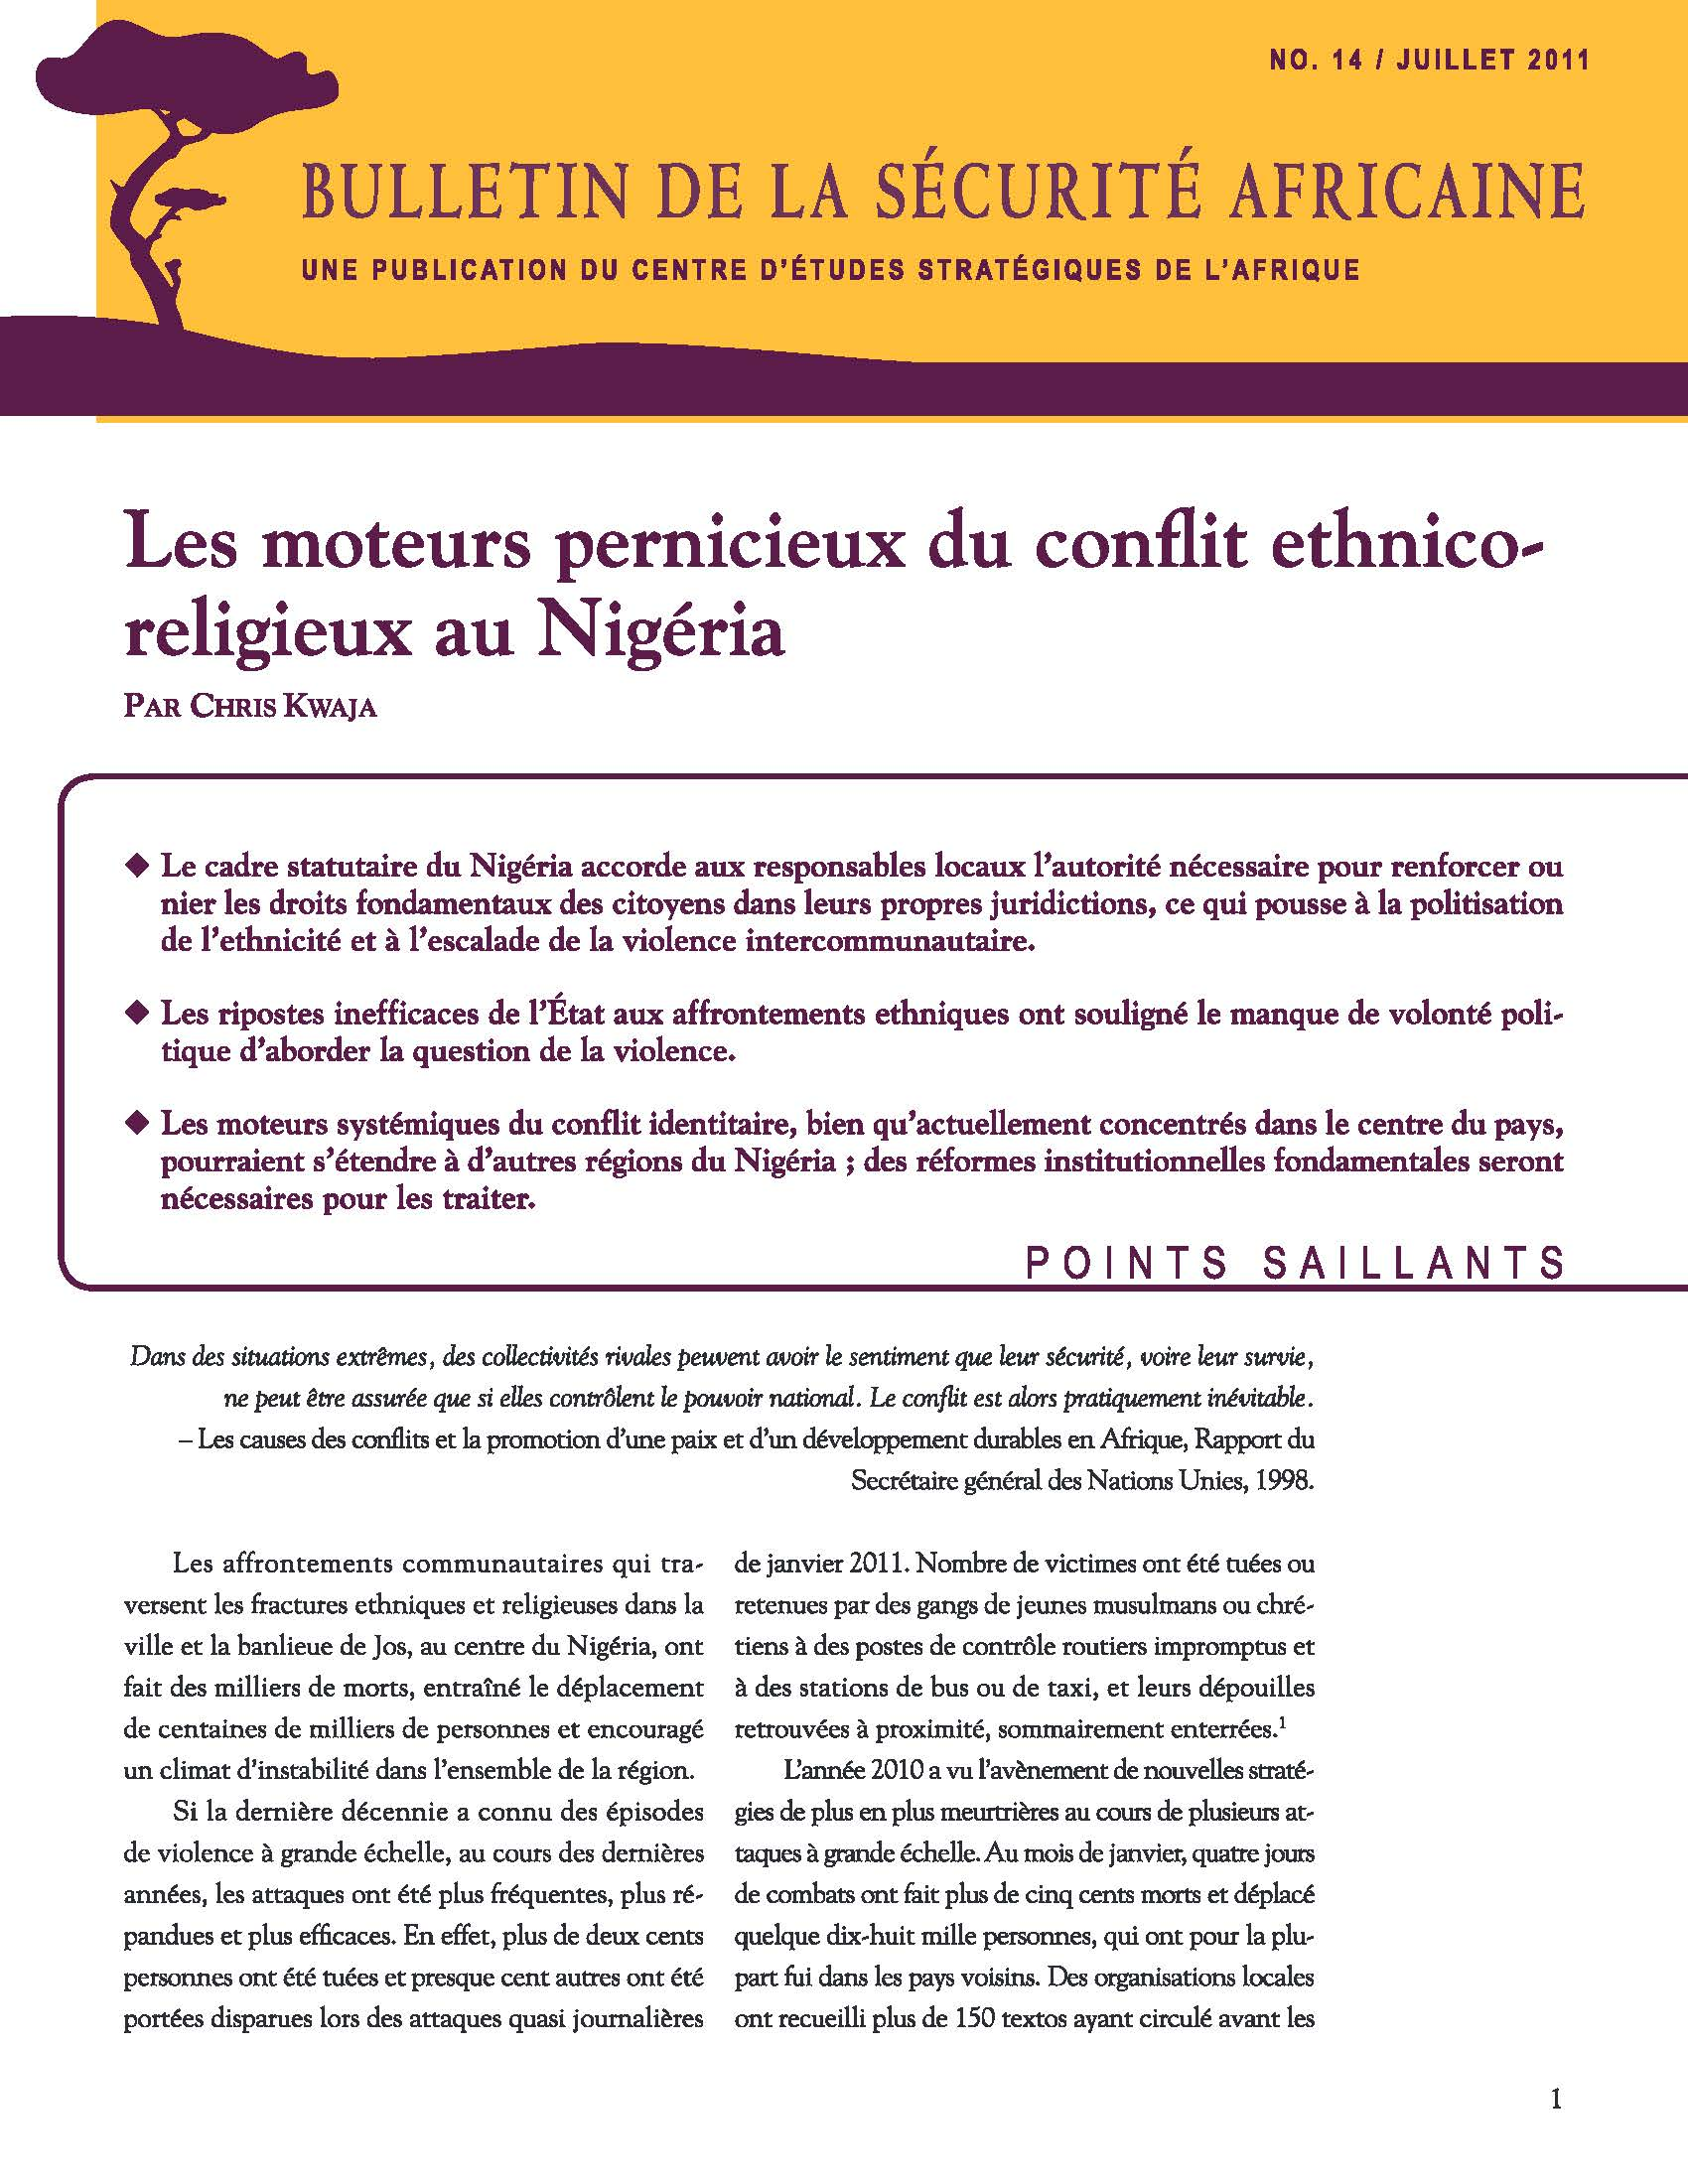 Africa-Security-Brief-No.-14-FR page 1